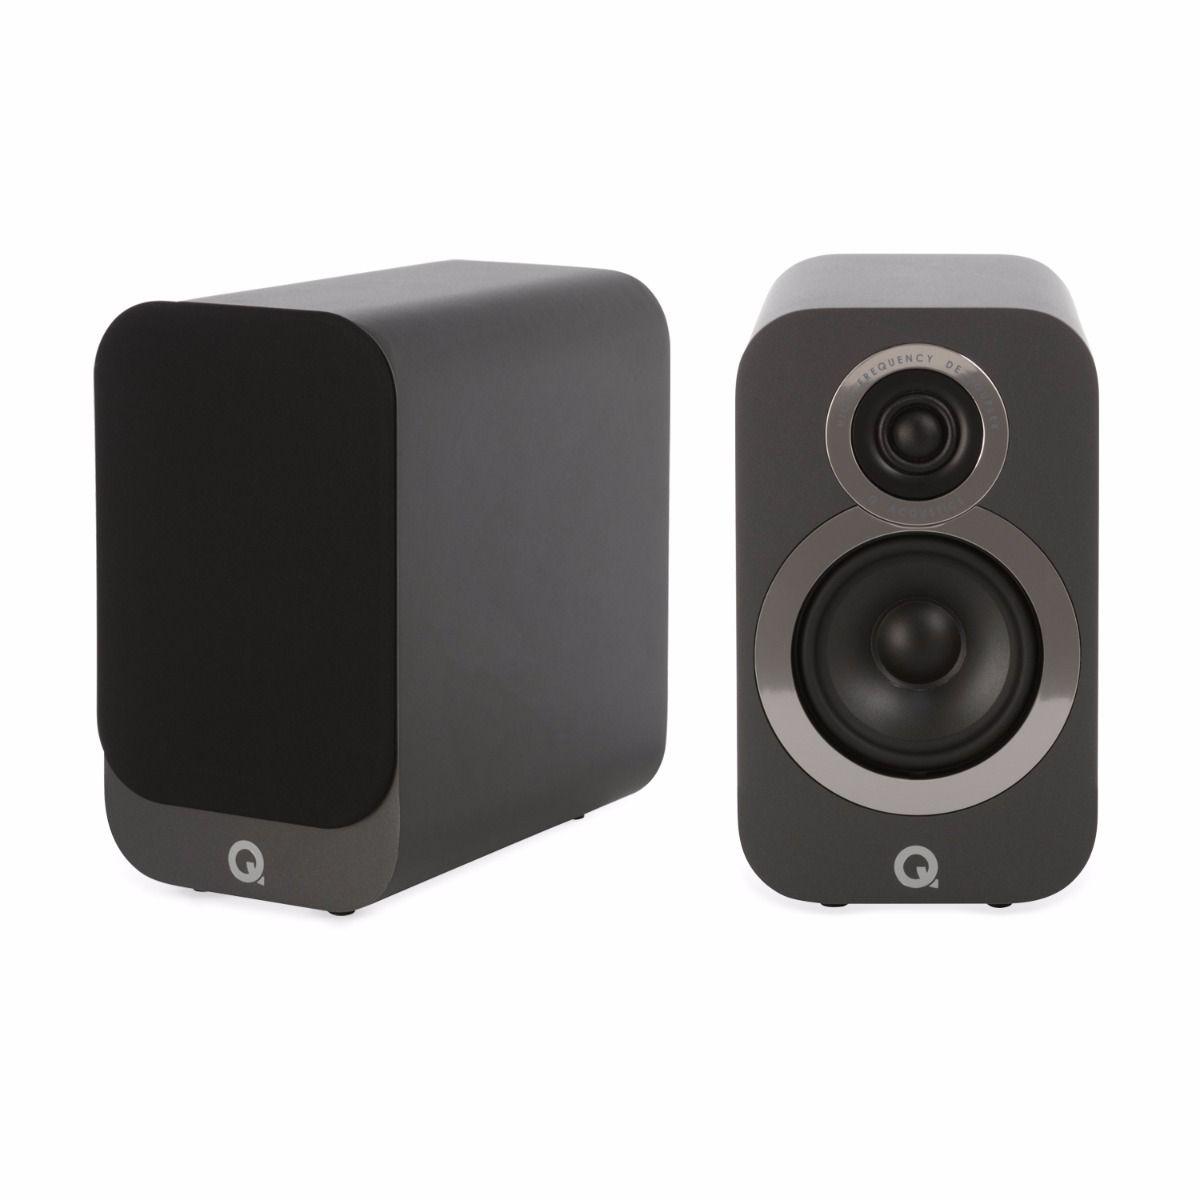 Q Acoustics 3010i Regal Lautsprecher Kaufen Bei Hifisound De